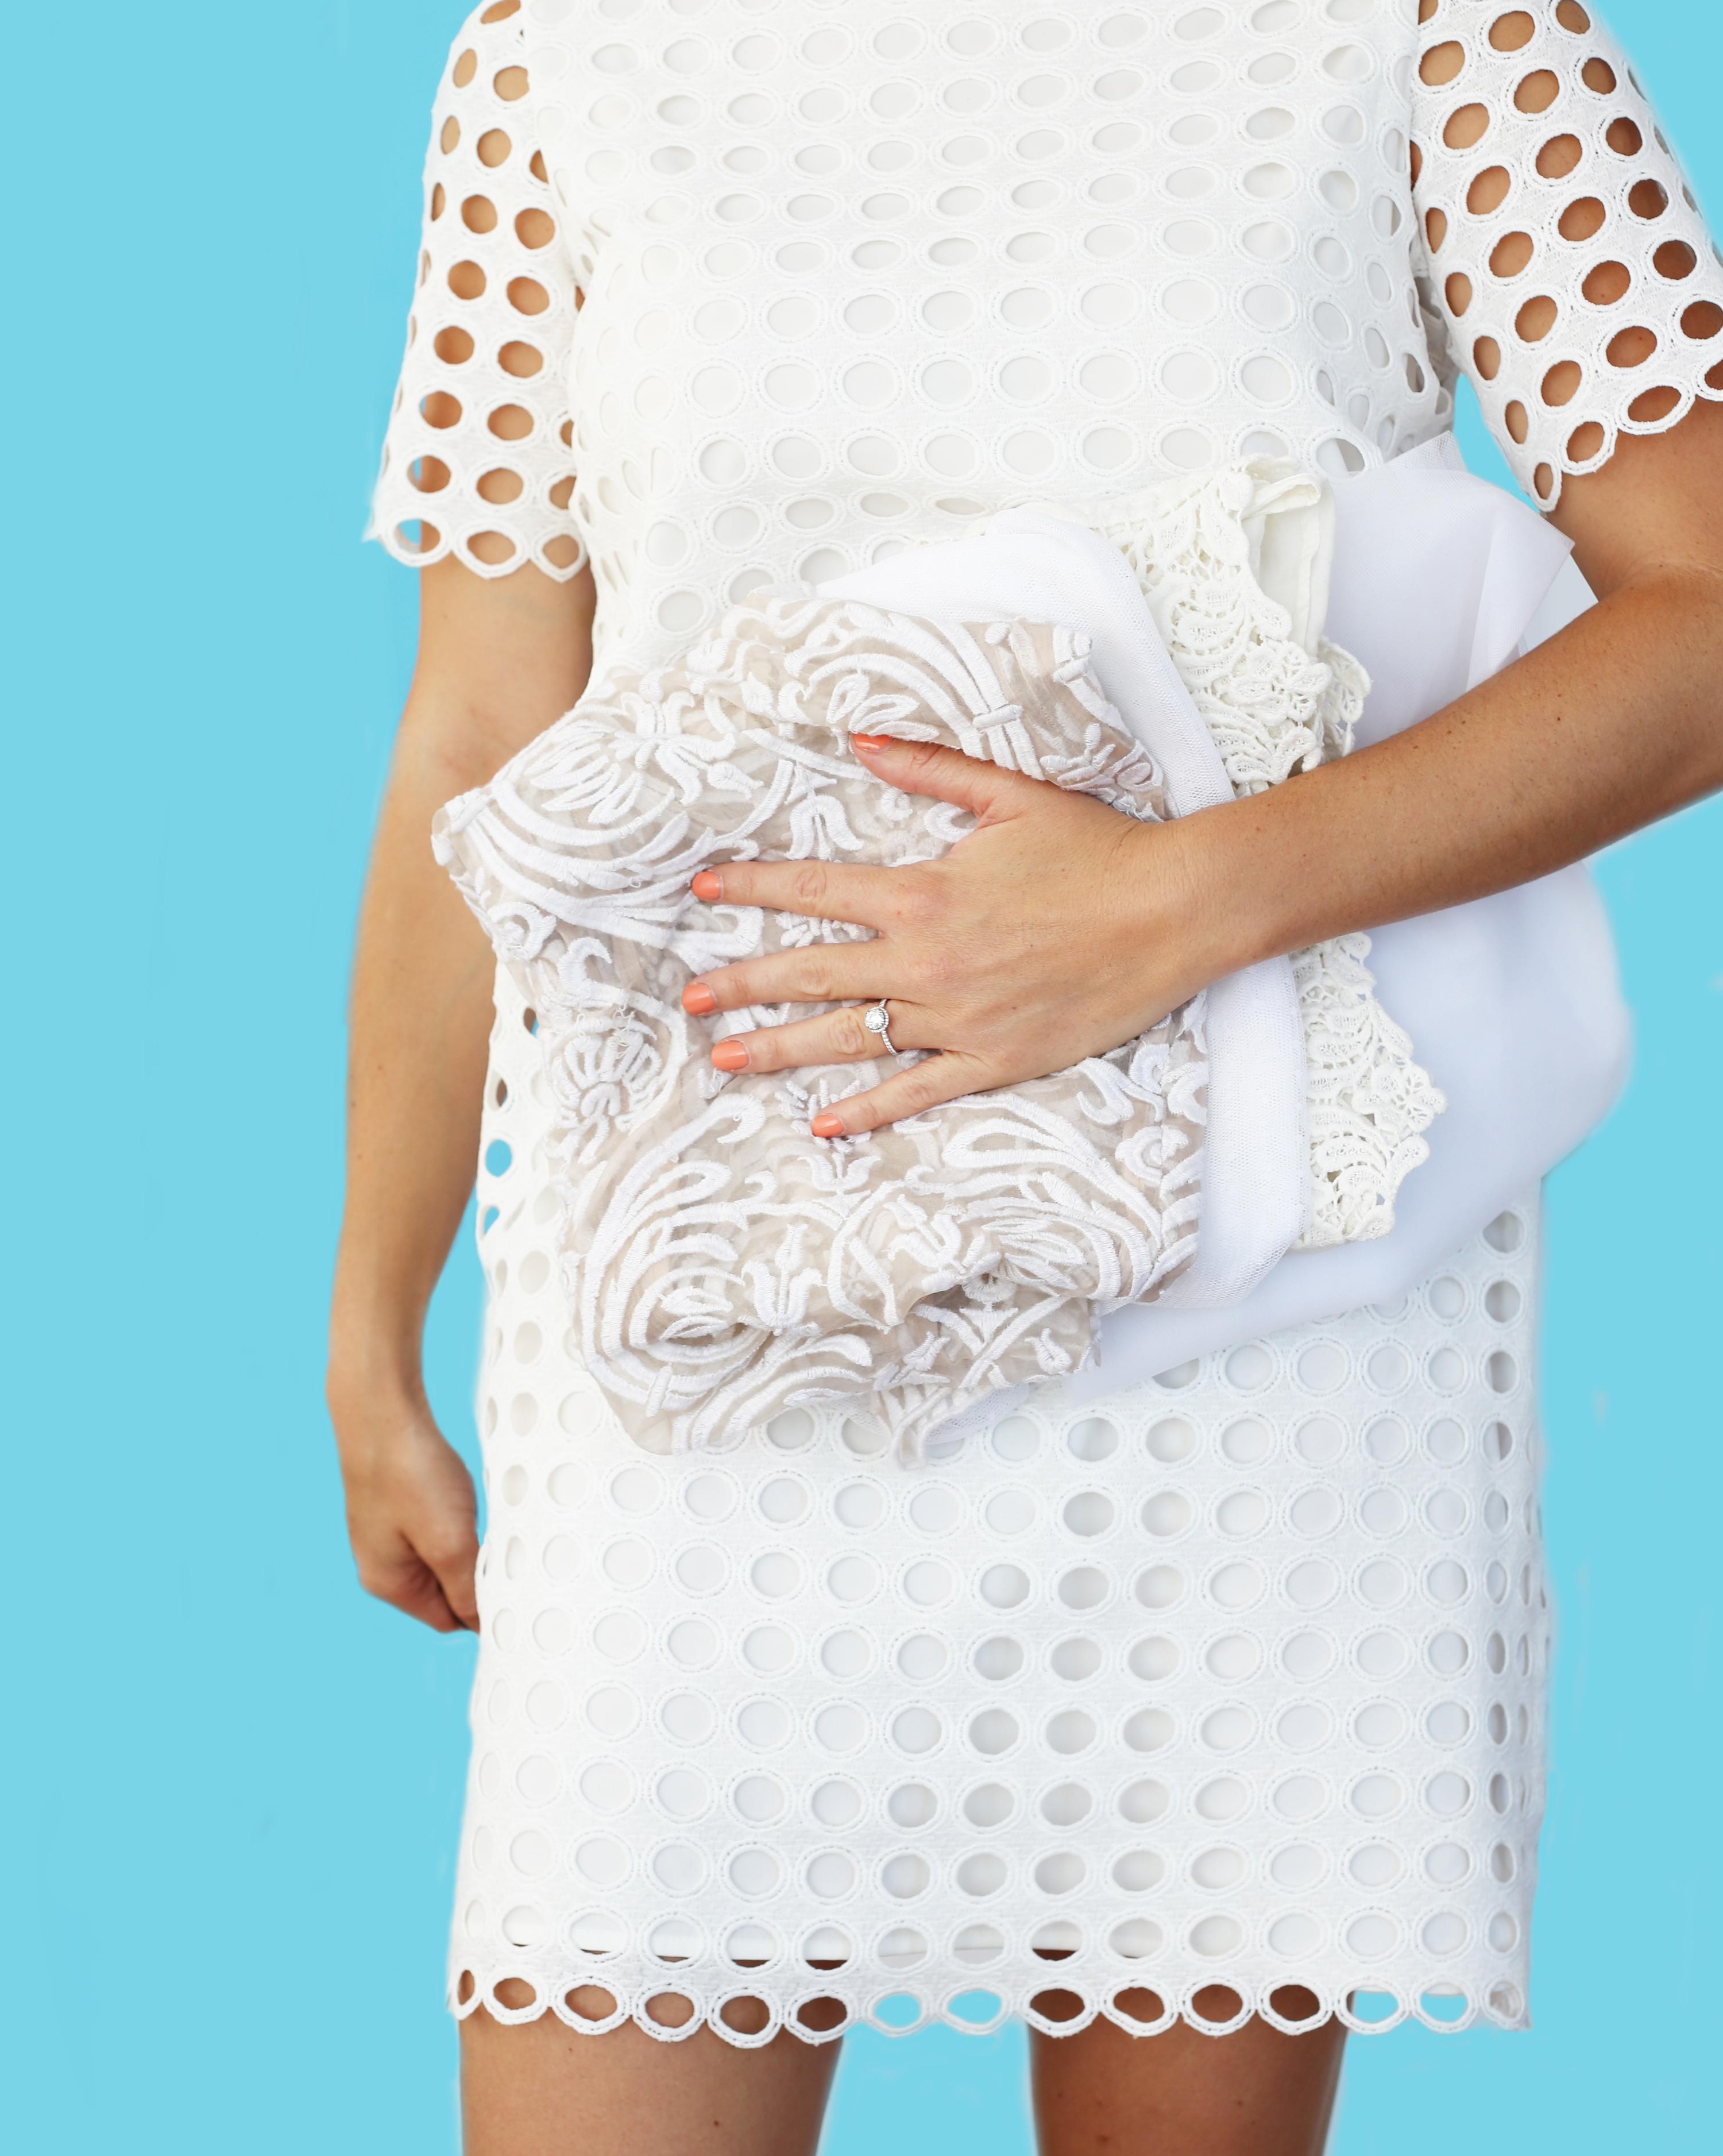 dress-shopping-tips-holding-fabric-0815.jpg